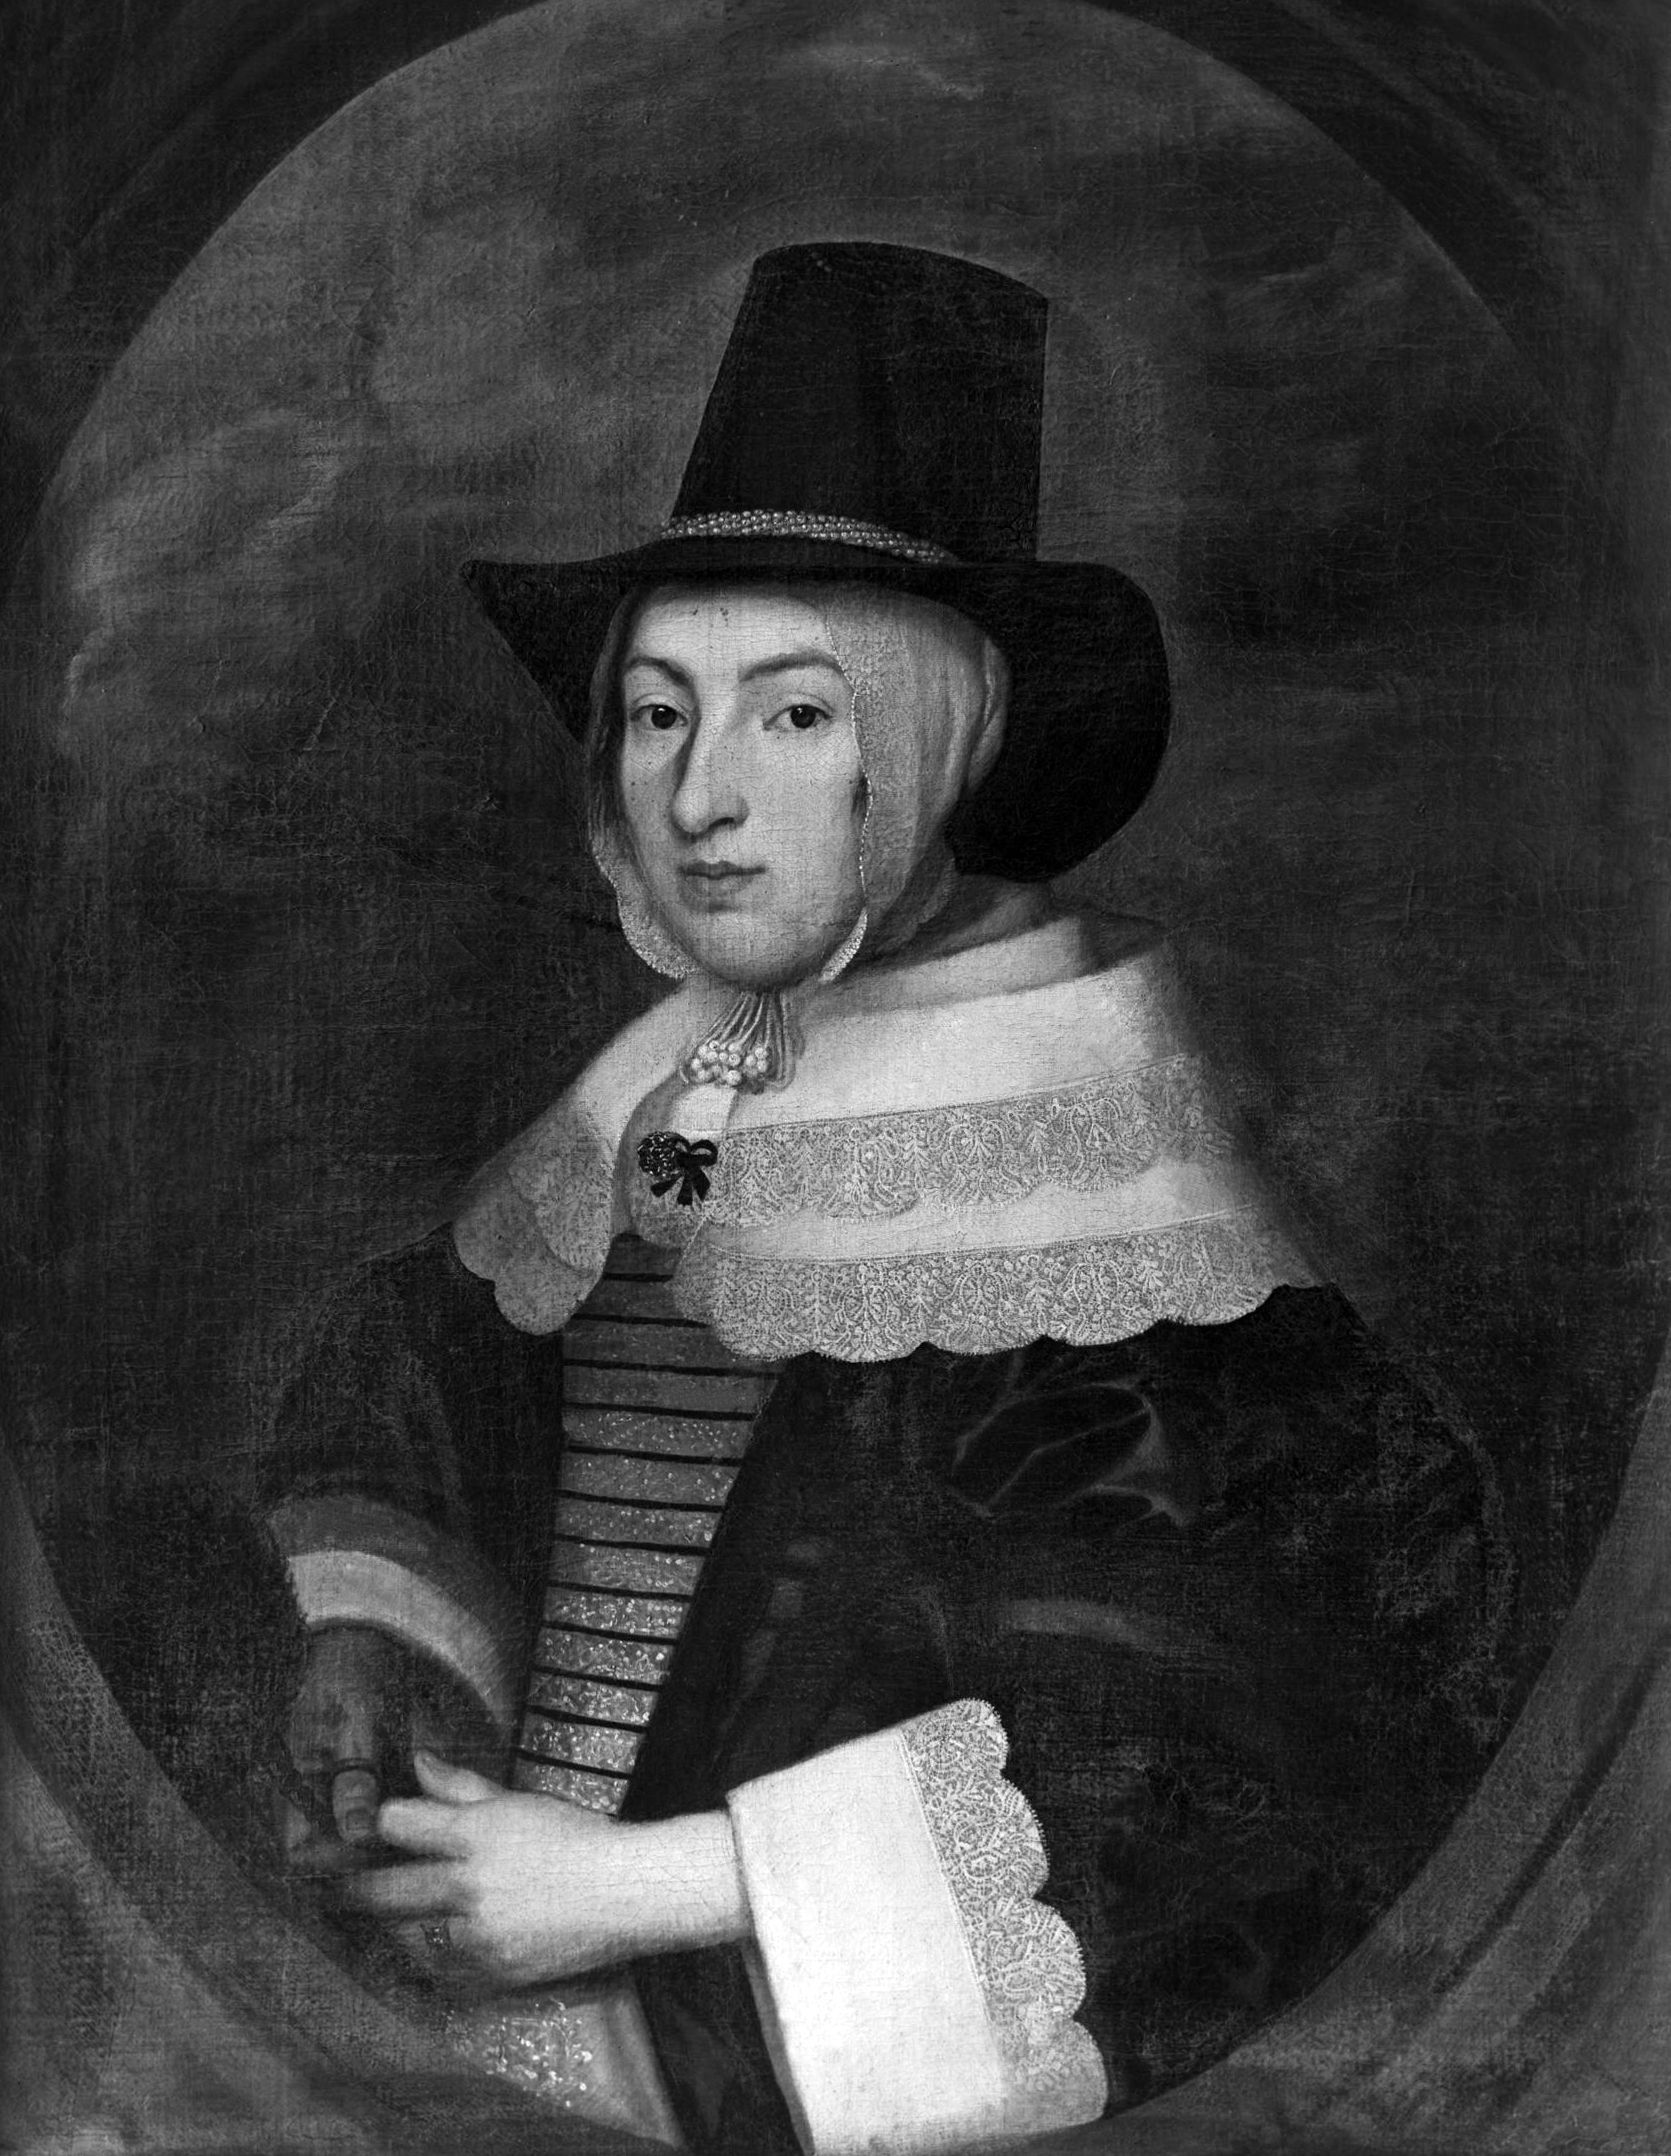 Hendriks Wybrand Портрет Wouterus de Nooy 1786 Музей Франса